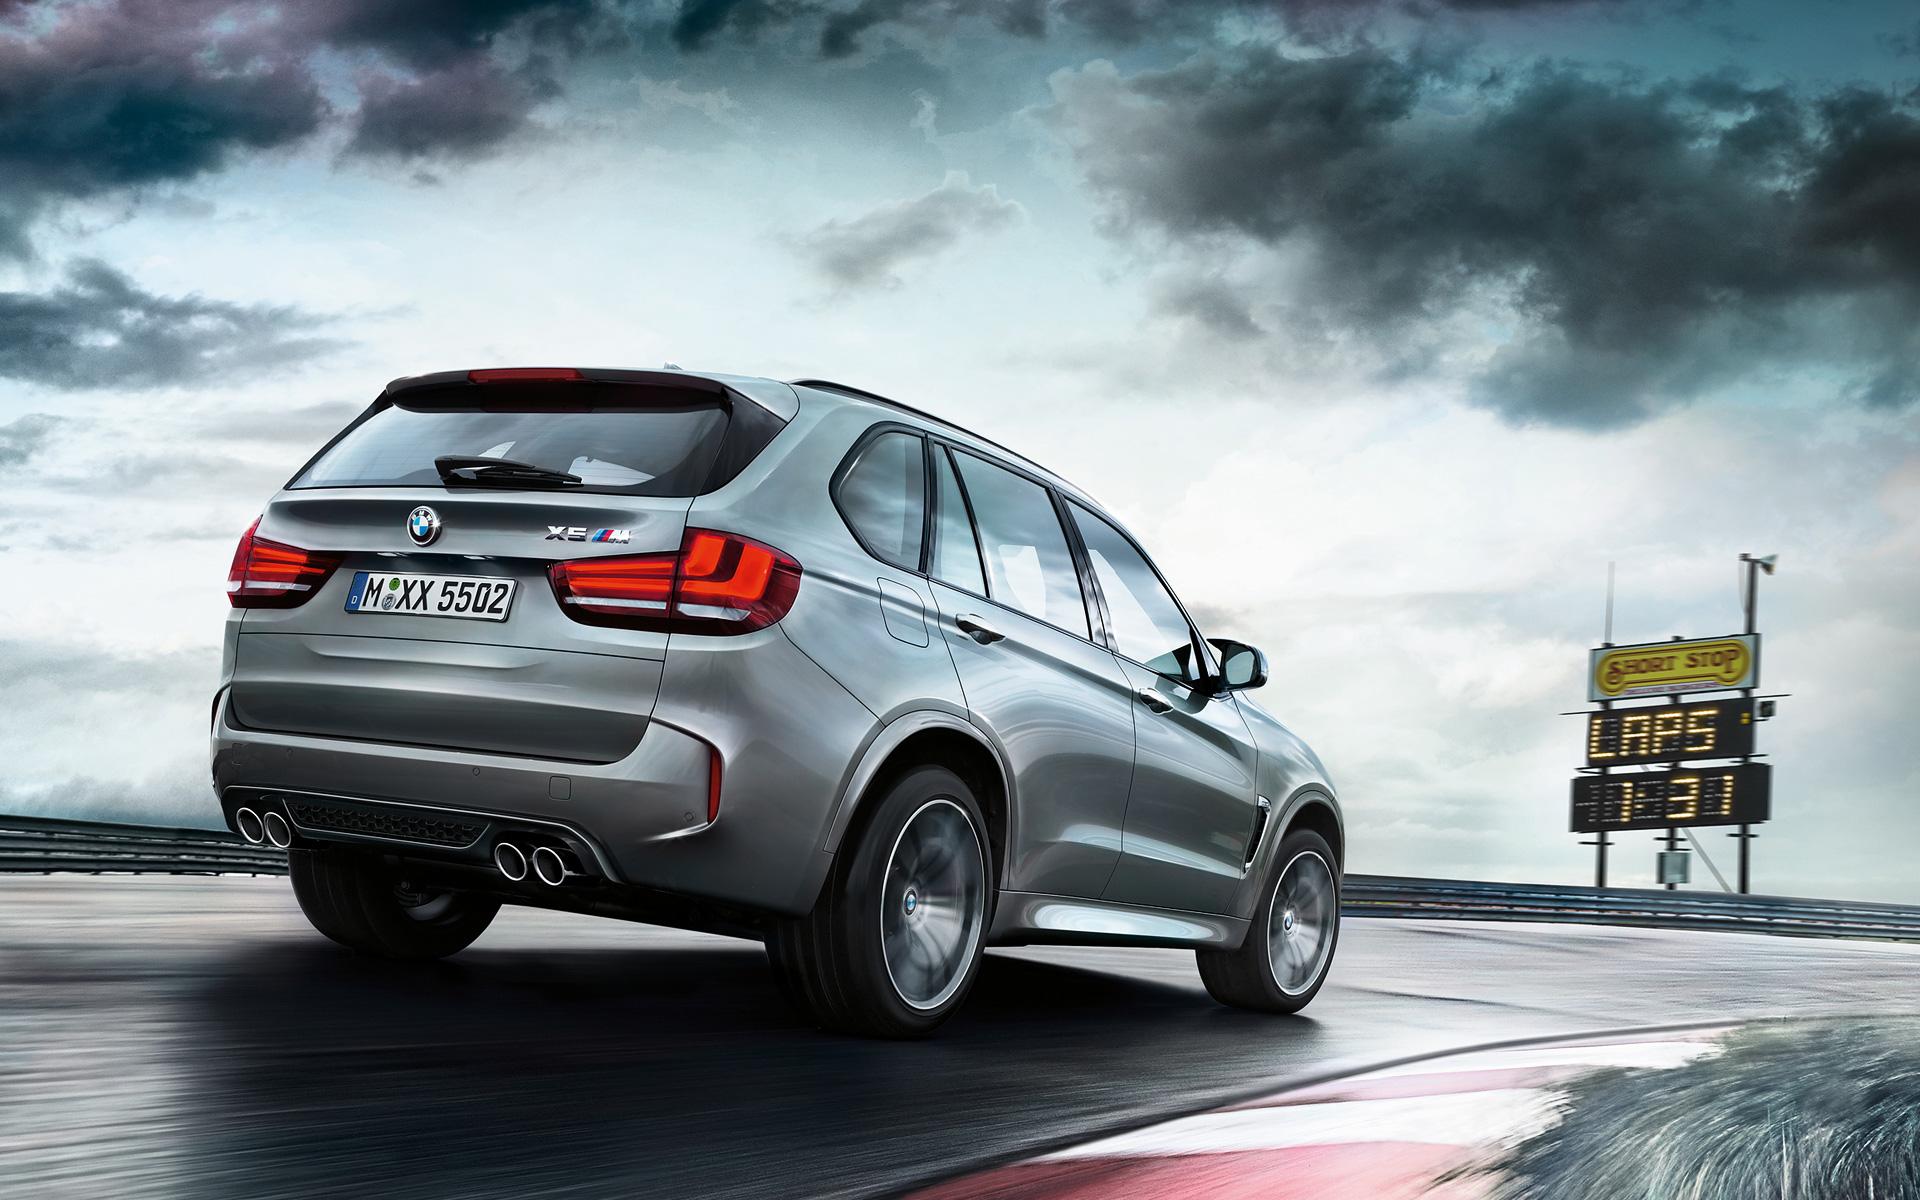 BMW X5 M : Kuvia ja videoita